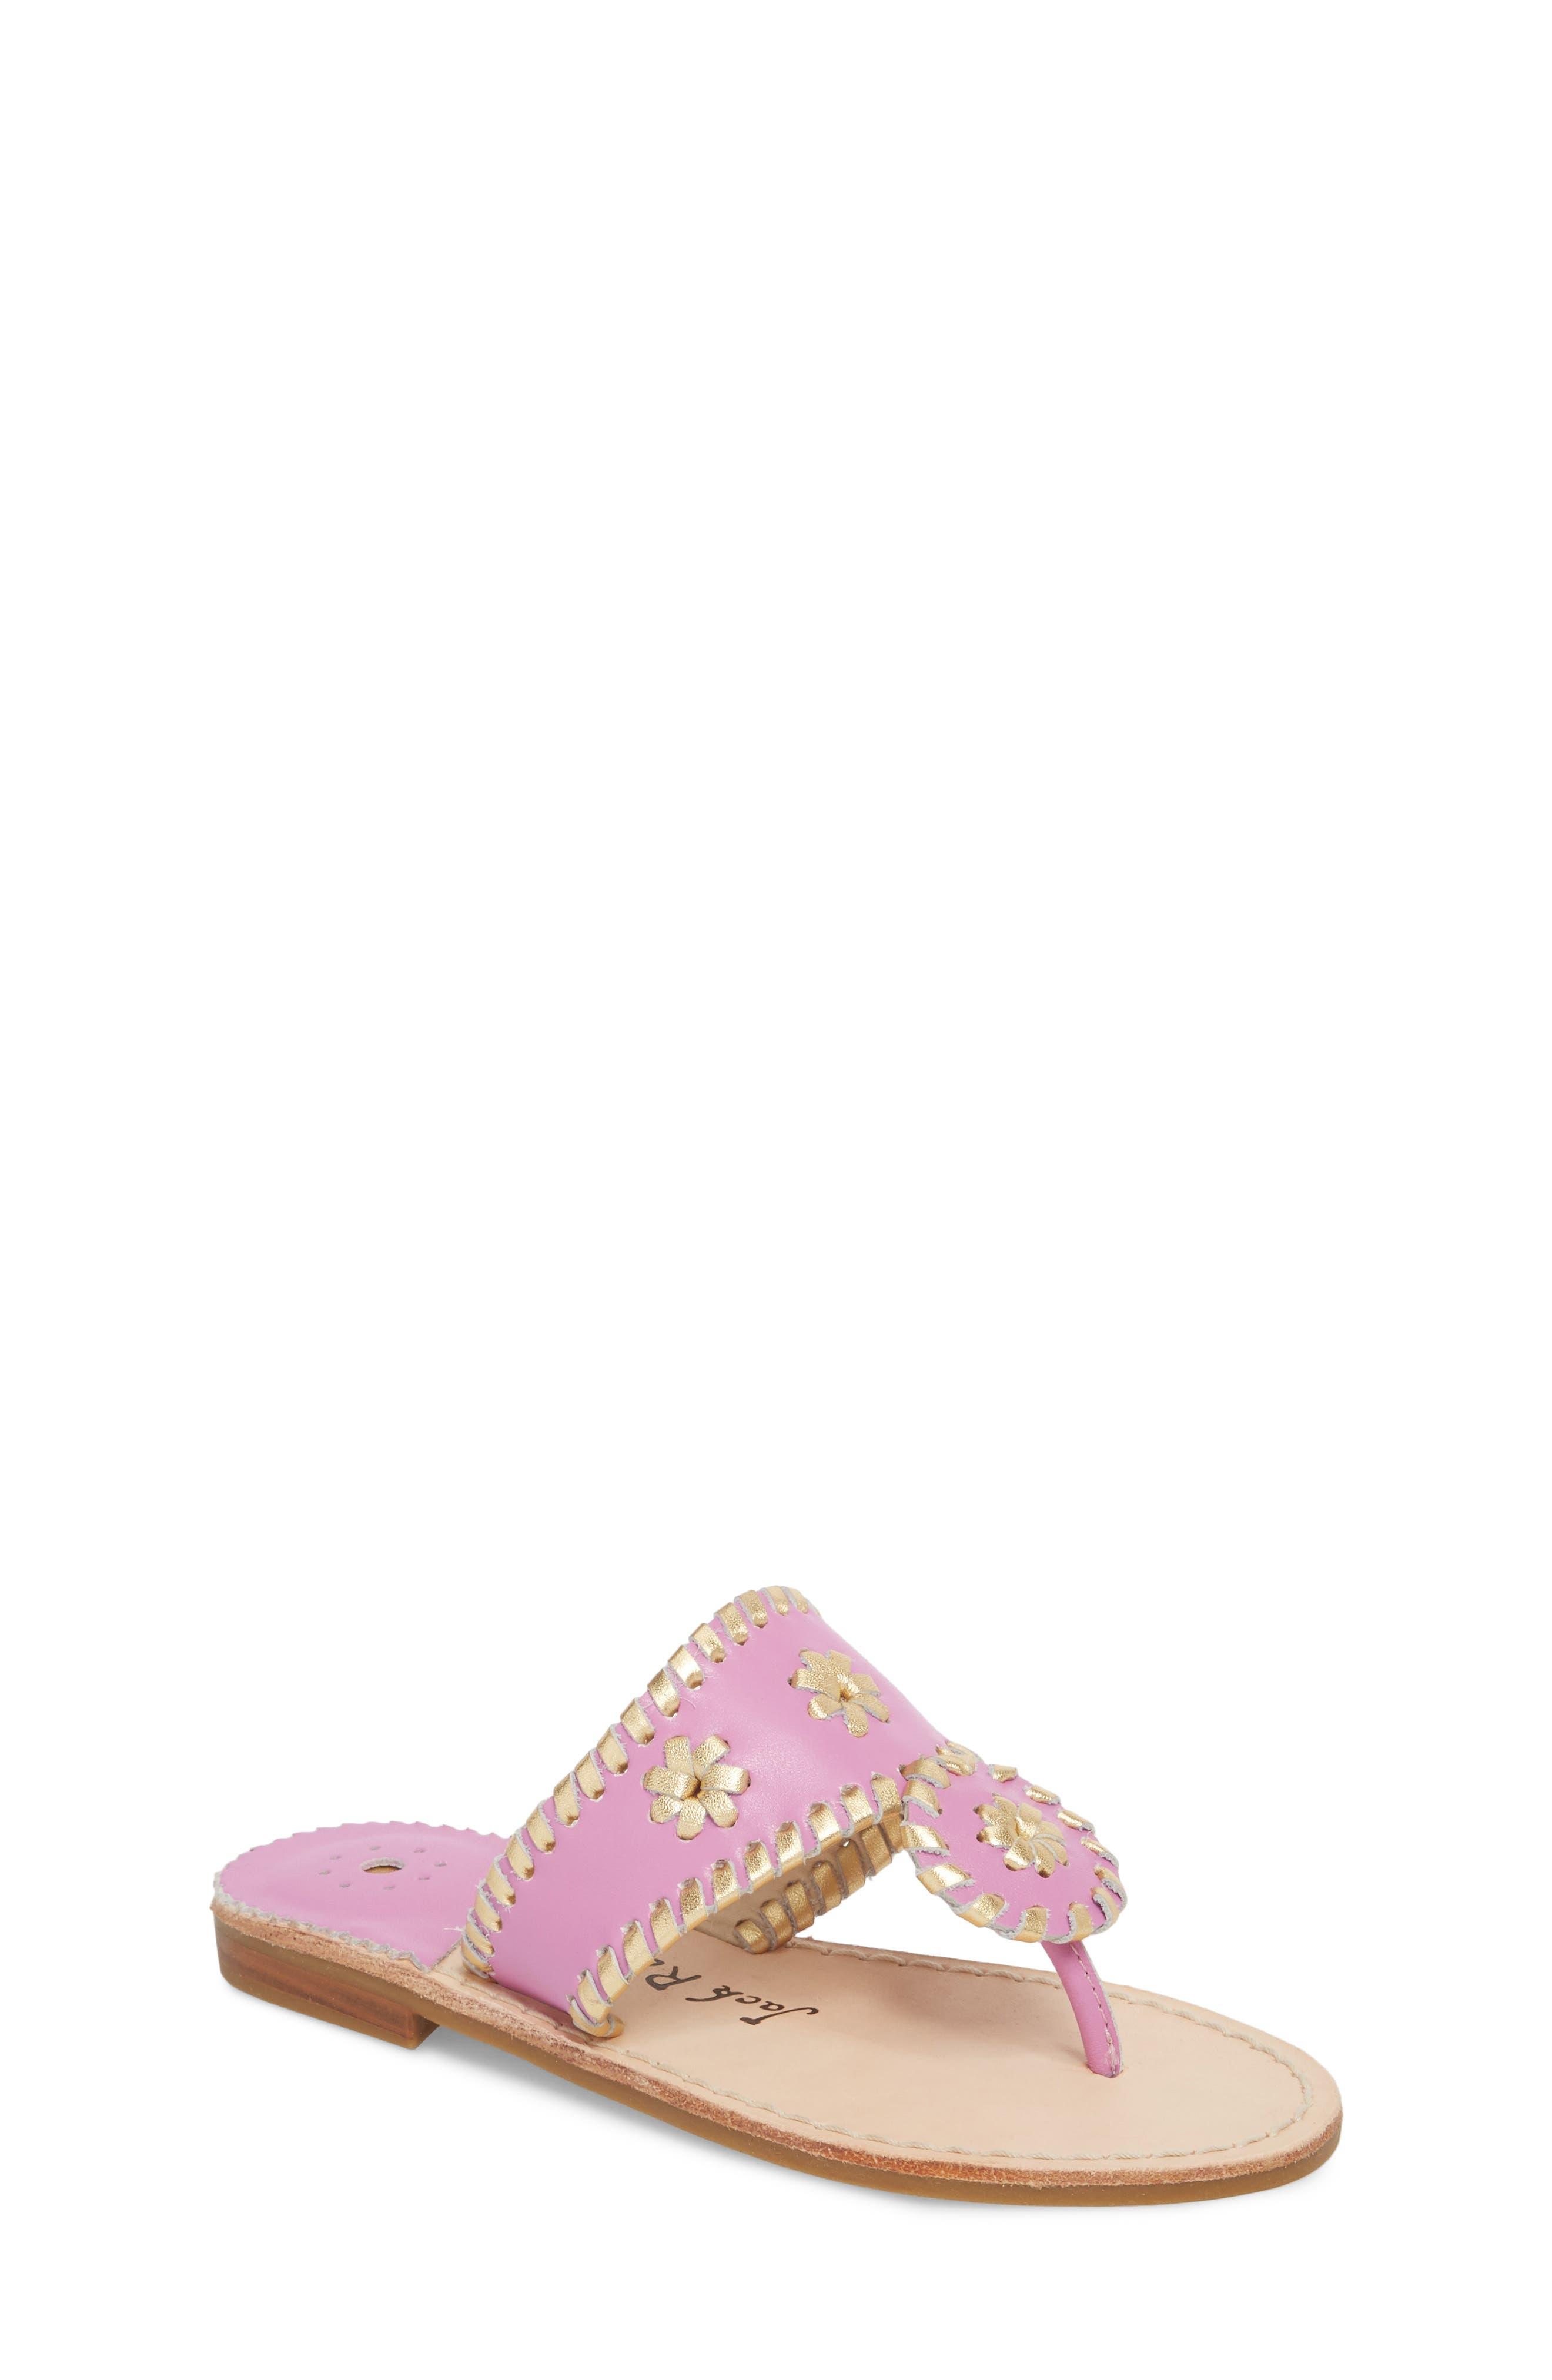 Miss Hollis Metallic Trim Thong Sandal,                             Main thumbnail 1, color,                             Lavender Pink/ Gold Leather